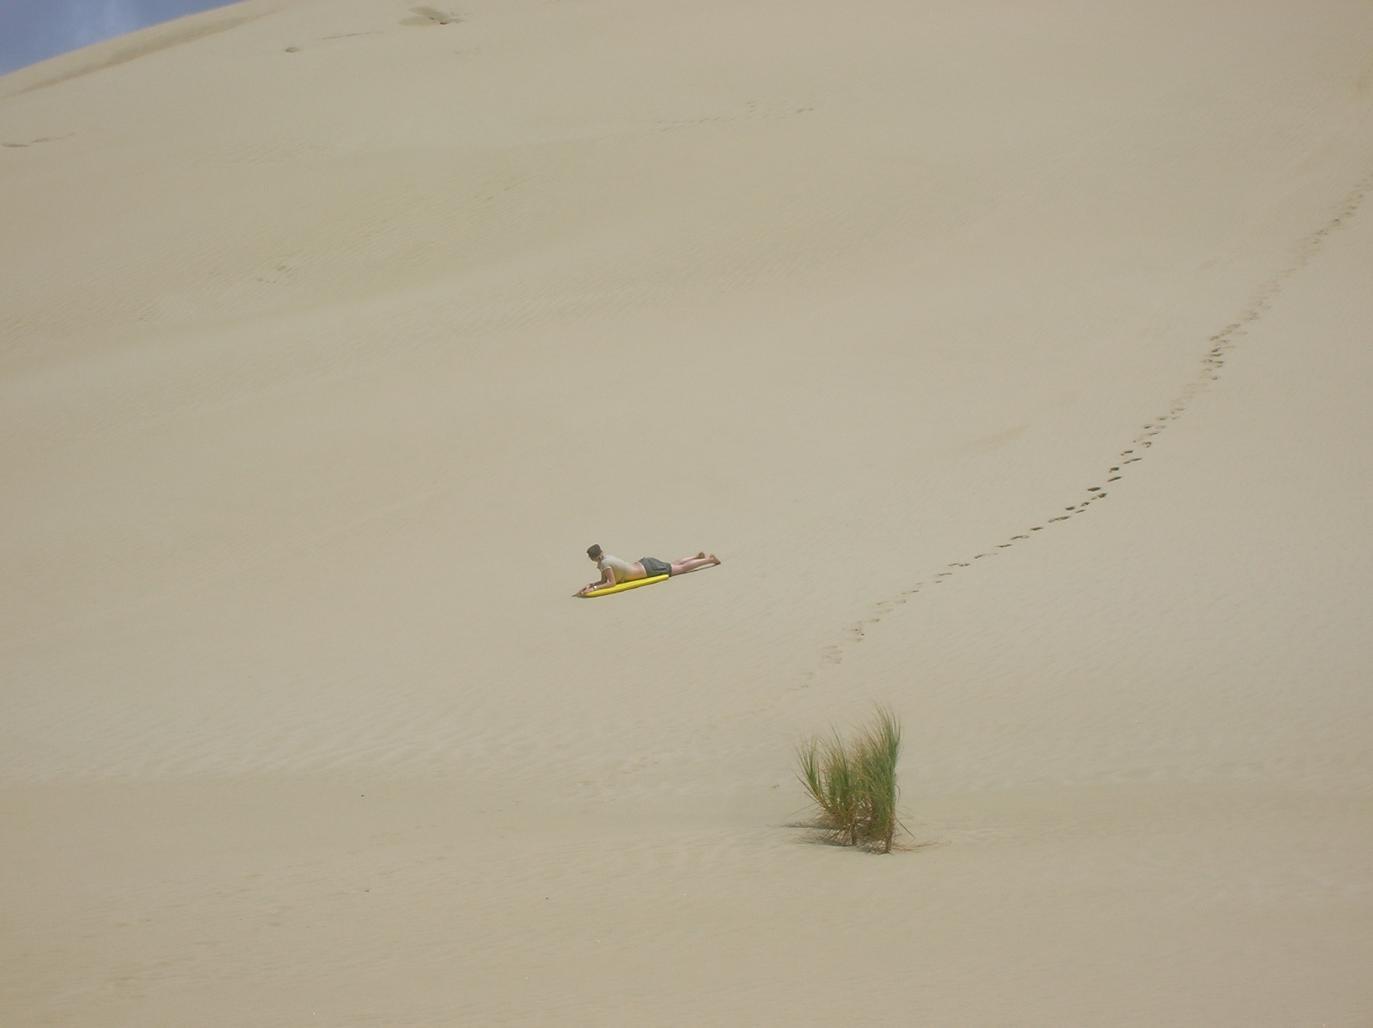 Sand Boarding 2